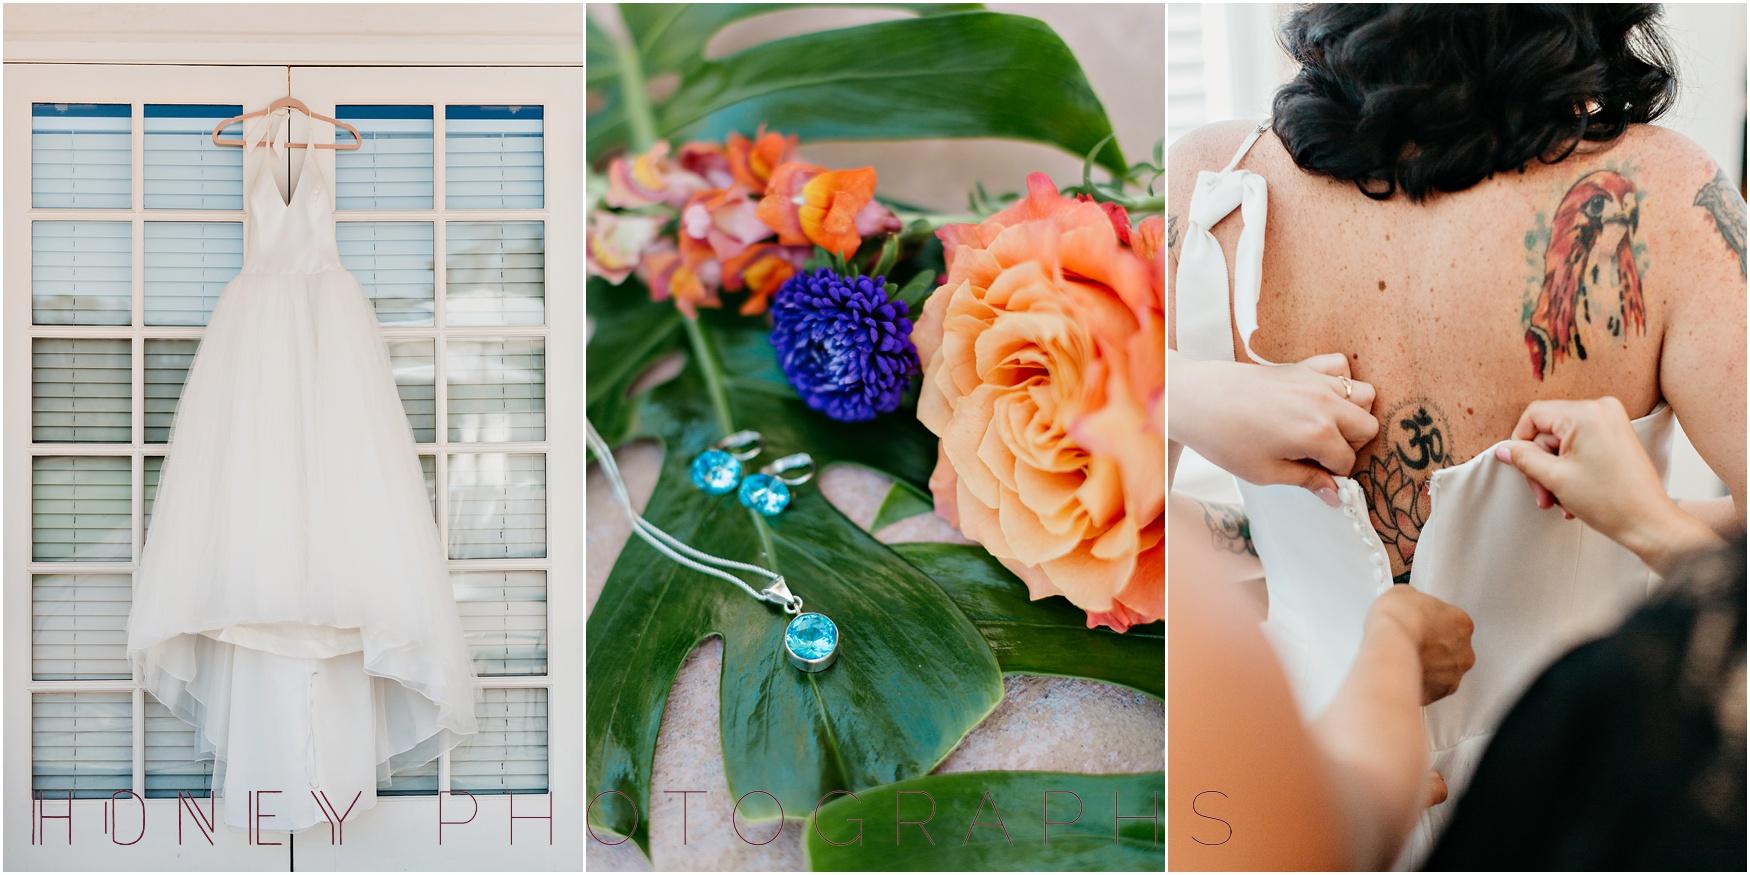 colorful_ecclectic_vibrant_vista_rainbow_quirky_wedding002.jpg